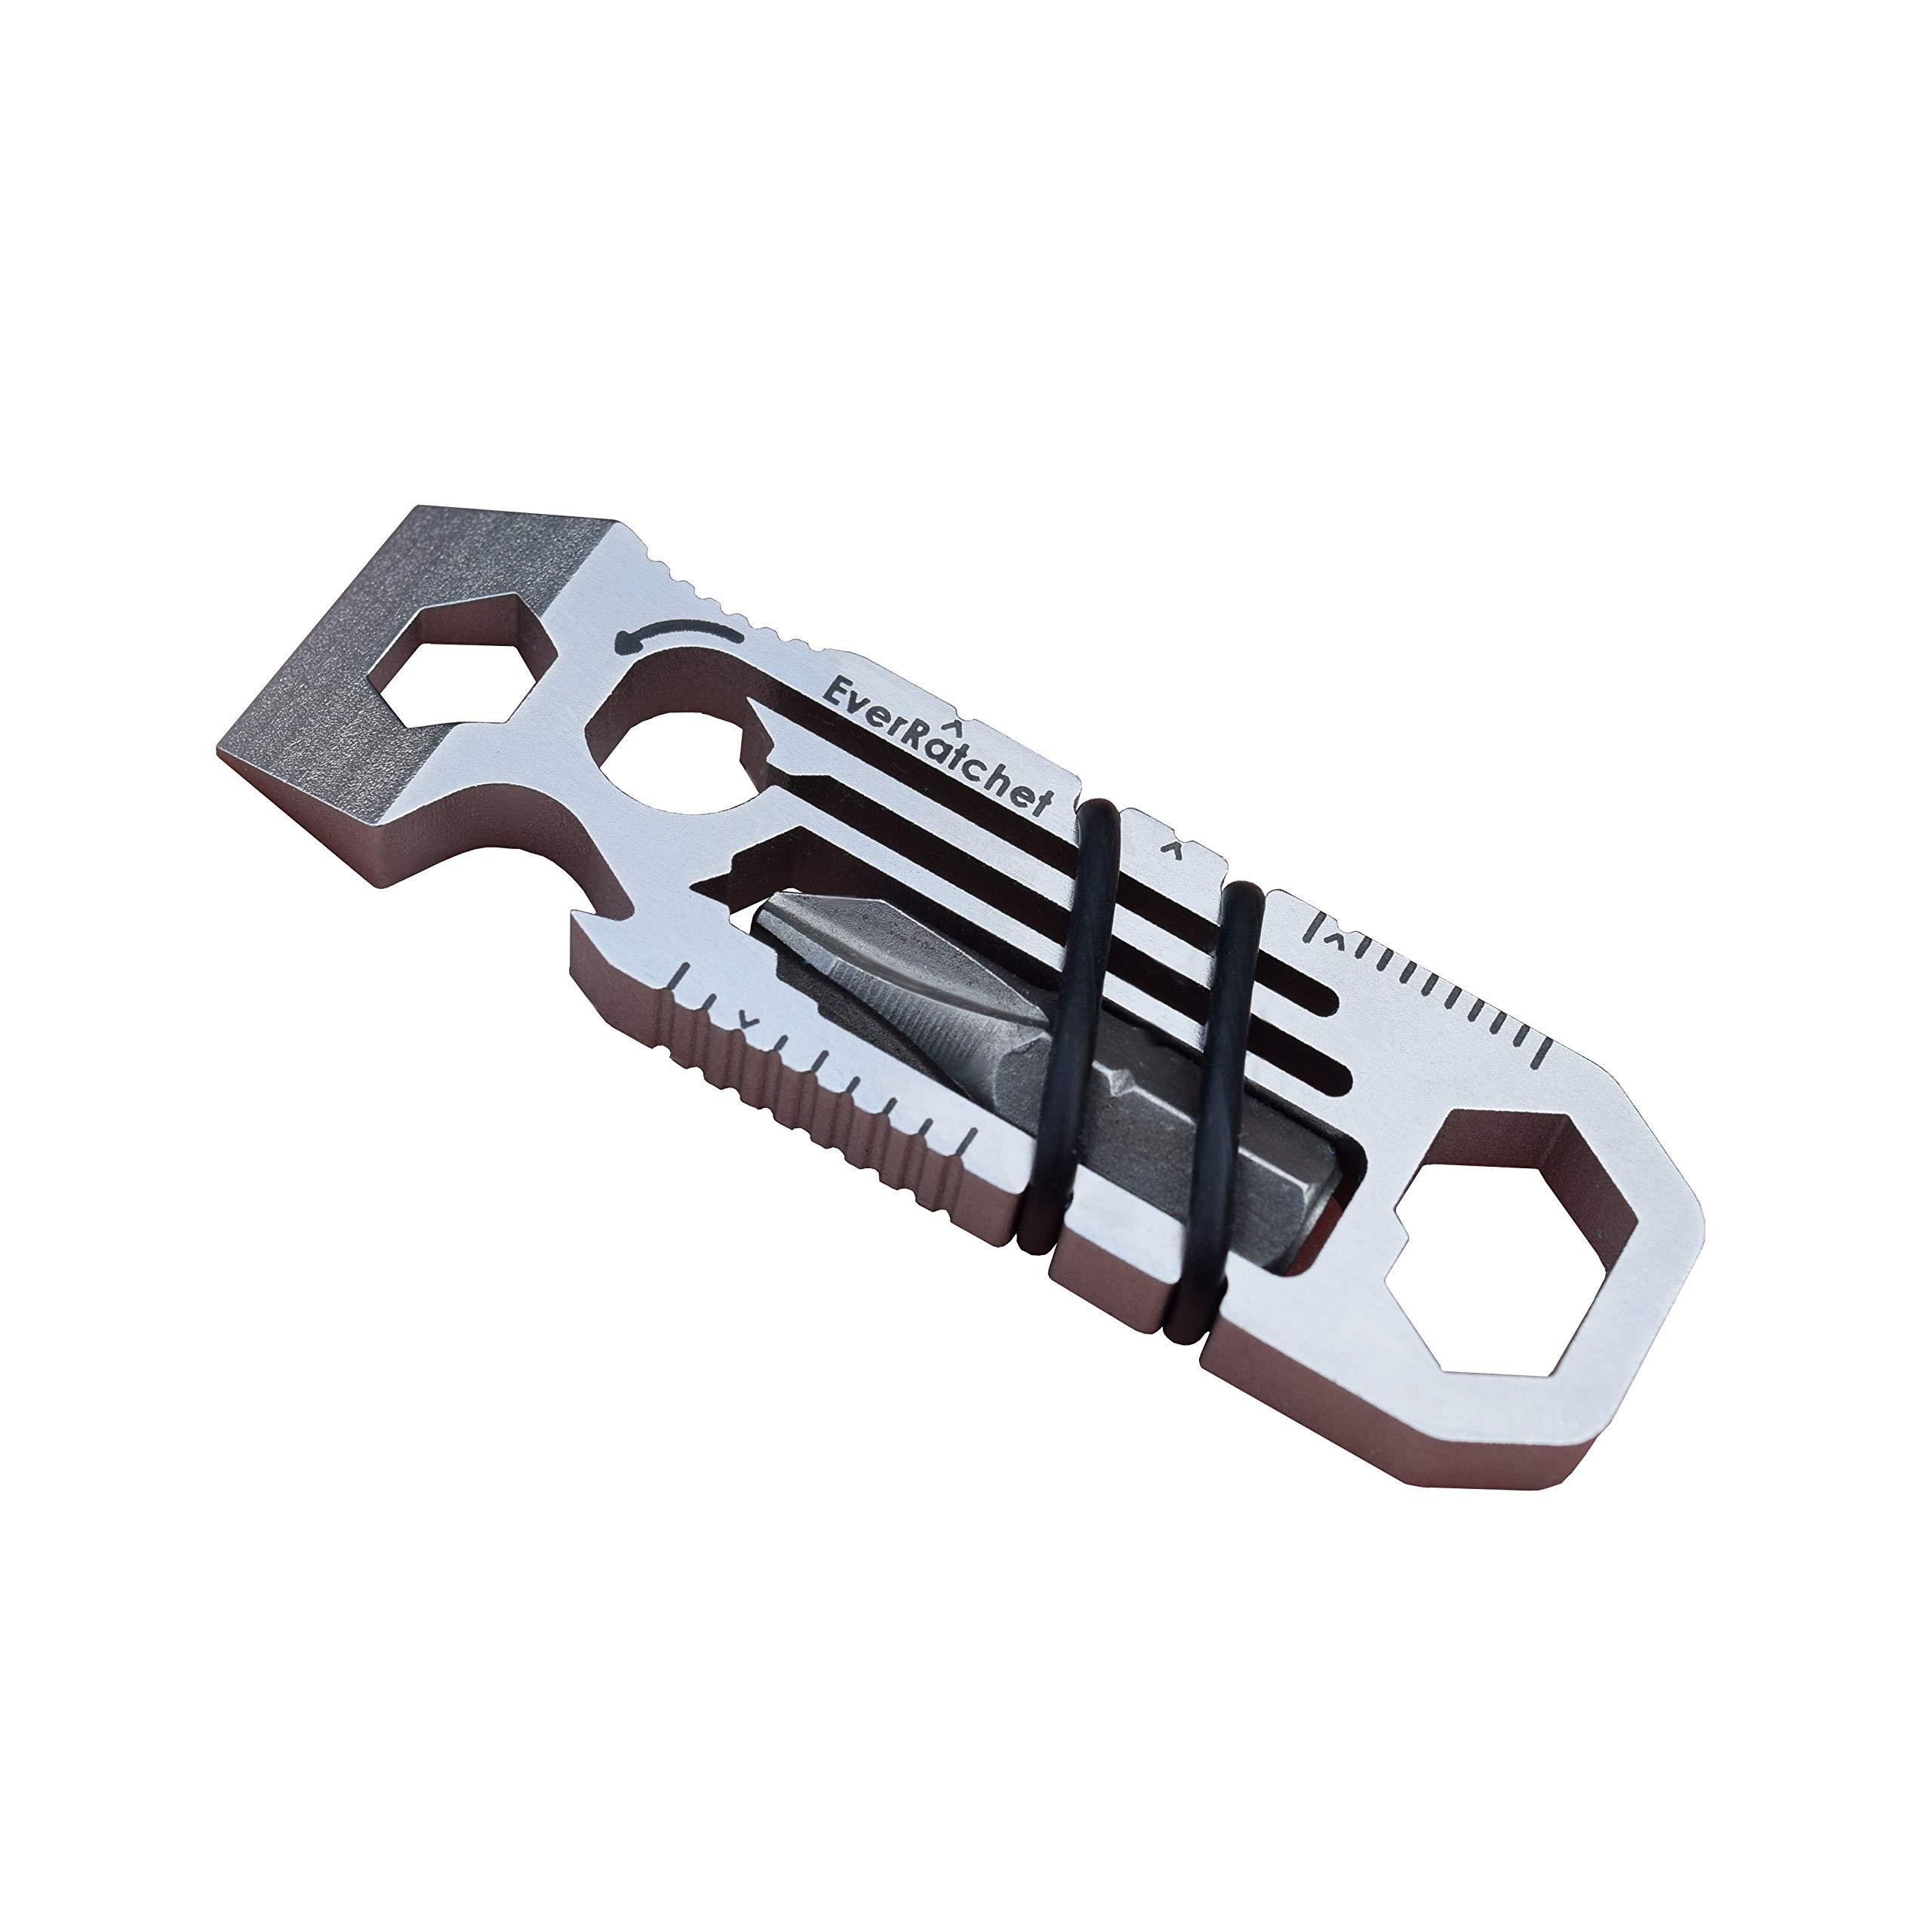 Ratcheting Keychain Tool